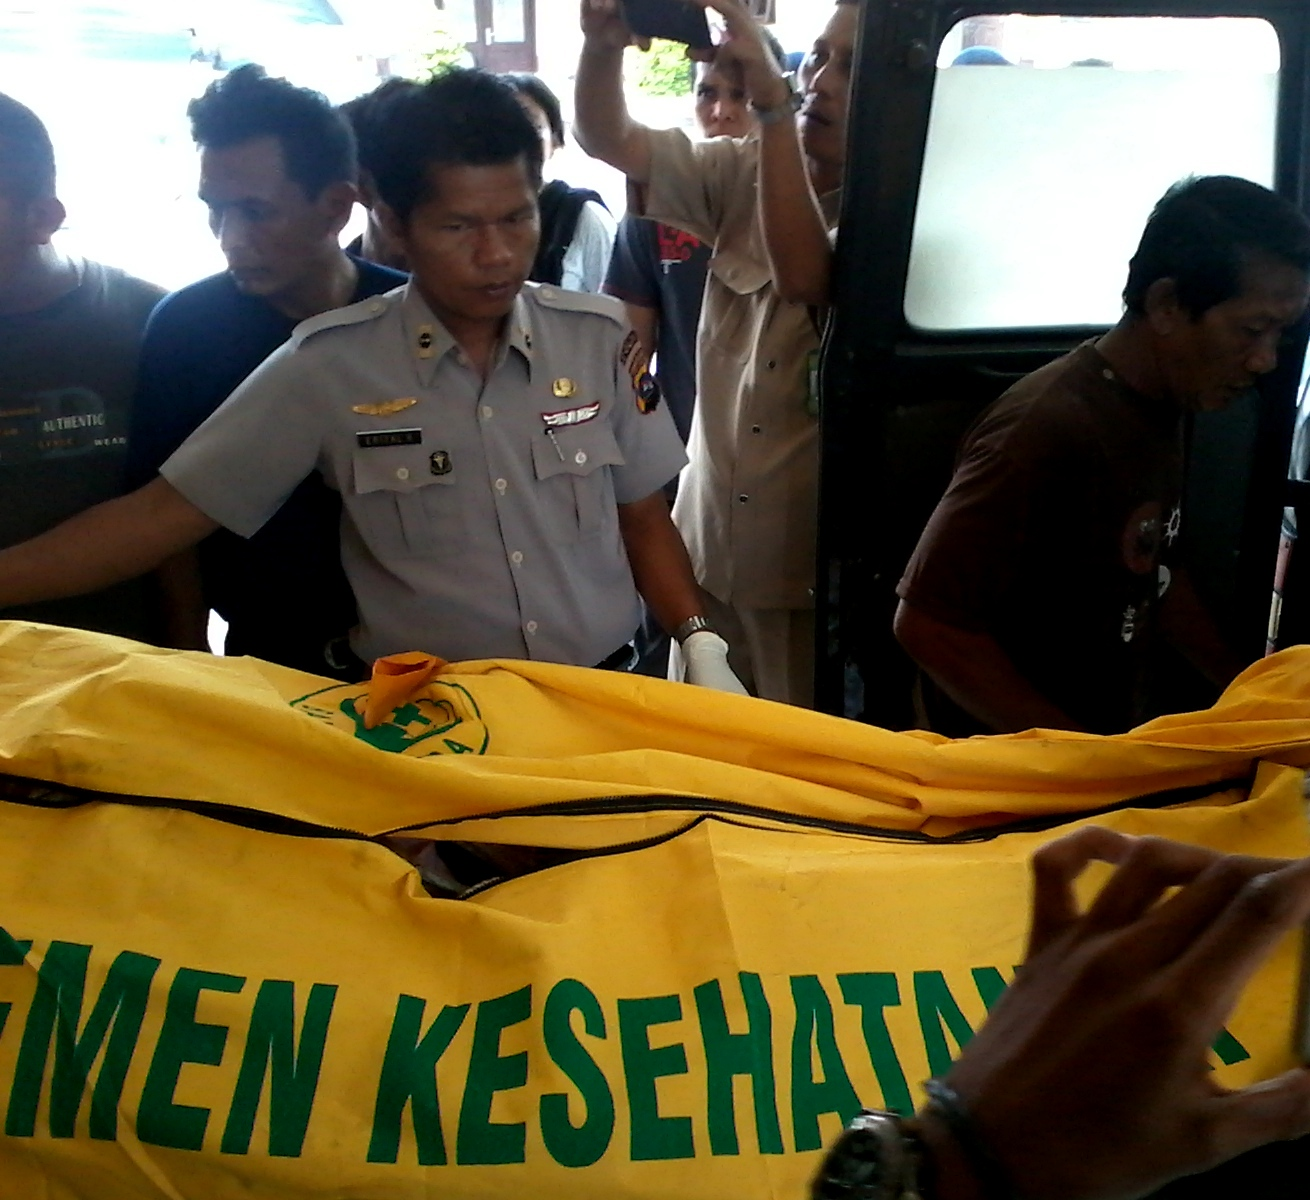 Korban setelah diautopsi di RS Bhayangkara Polda Sumbar. FOTO/WAN